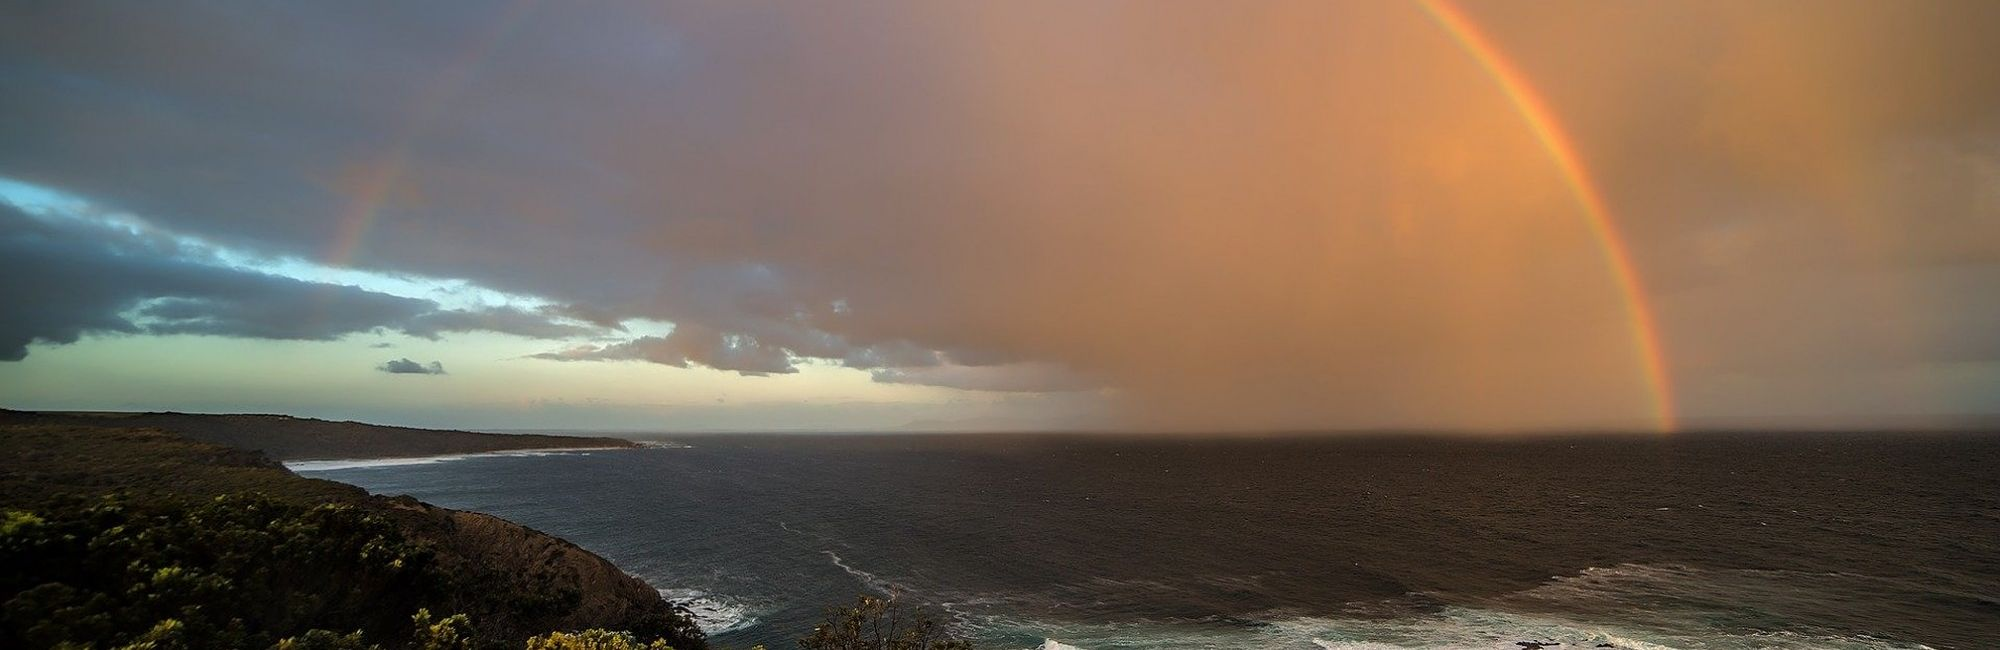 rainbow over stormy seas